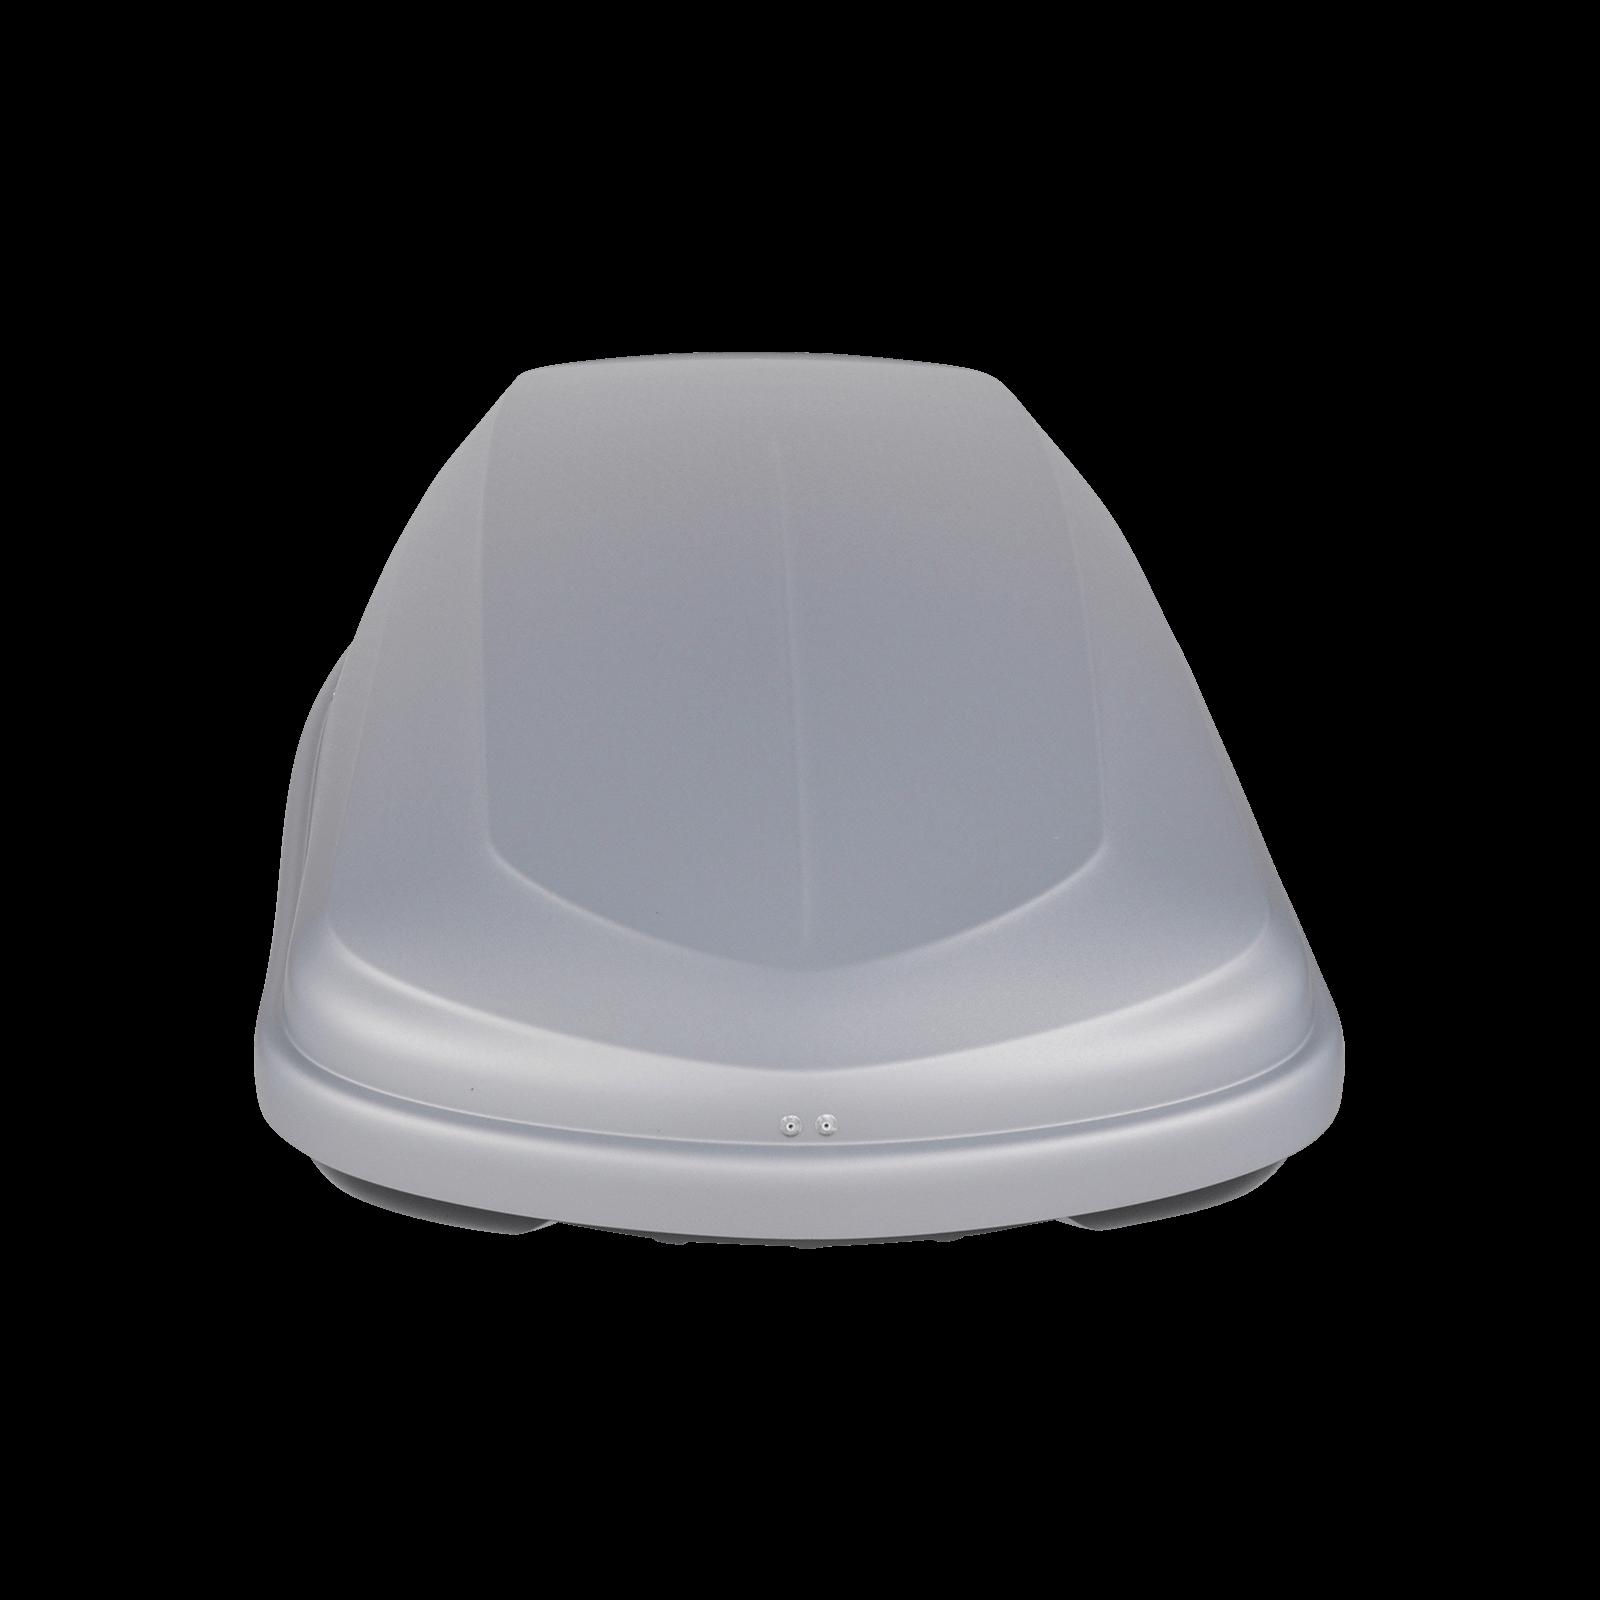 Dachbox Hapro Traxer 8.6 SilverGrey - Bild 3